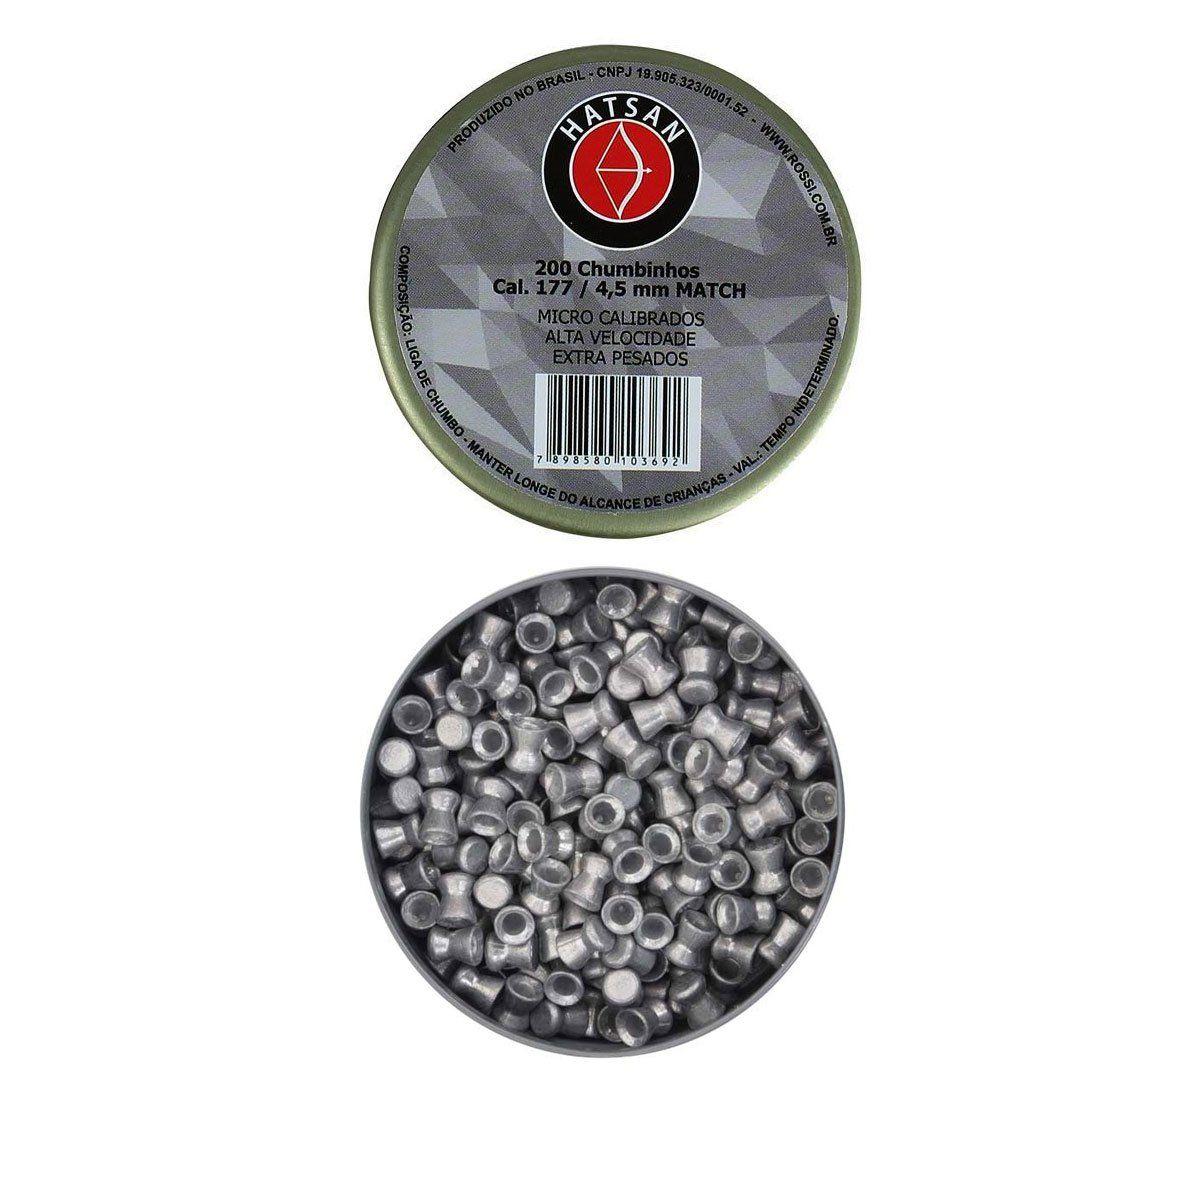 Chumbinho Hatsan Match 4,5mm 200 unidades